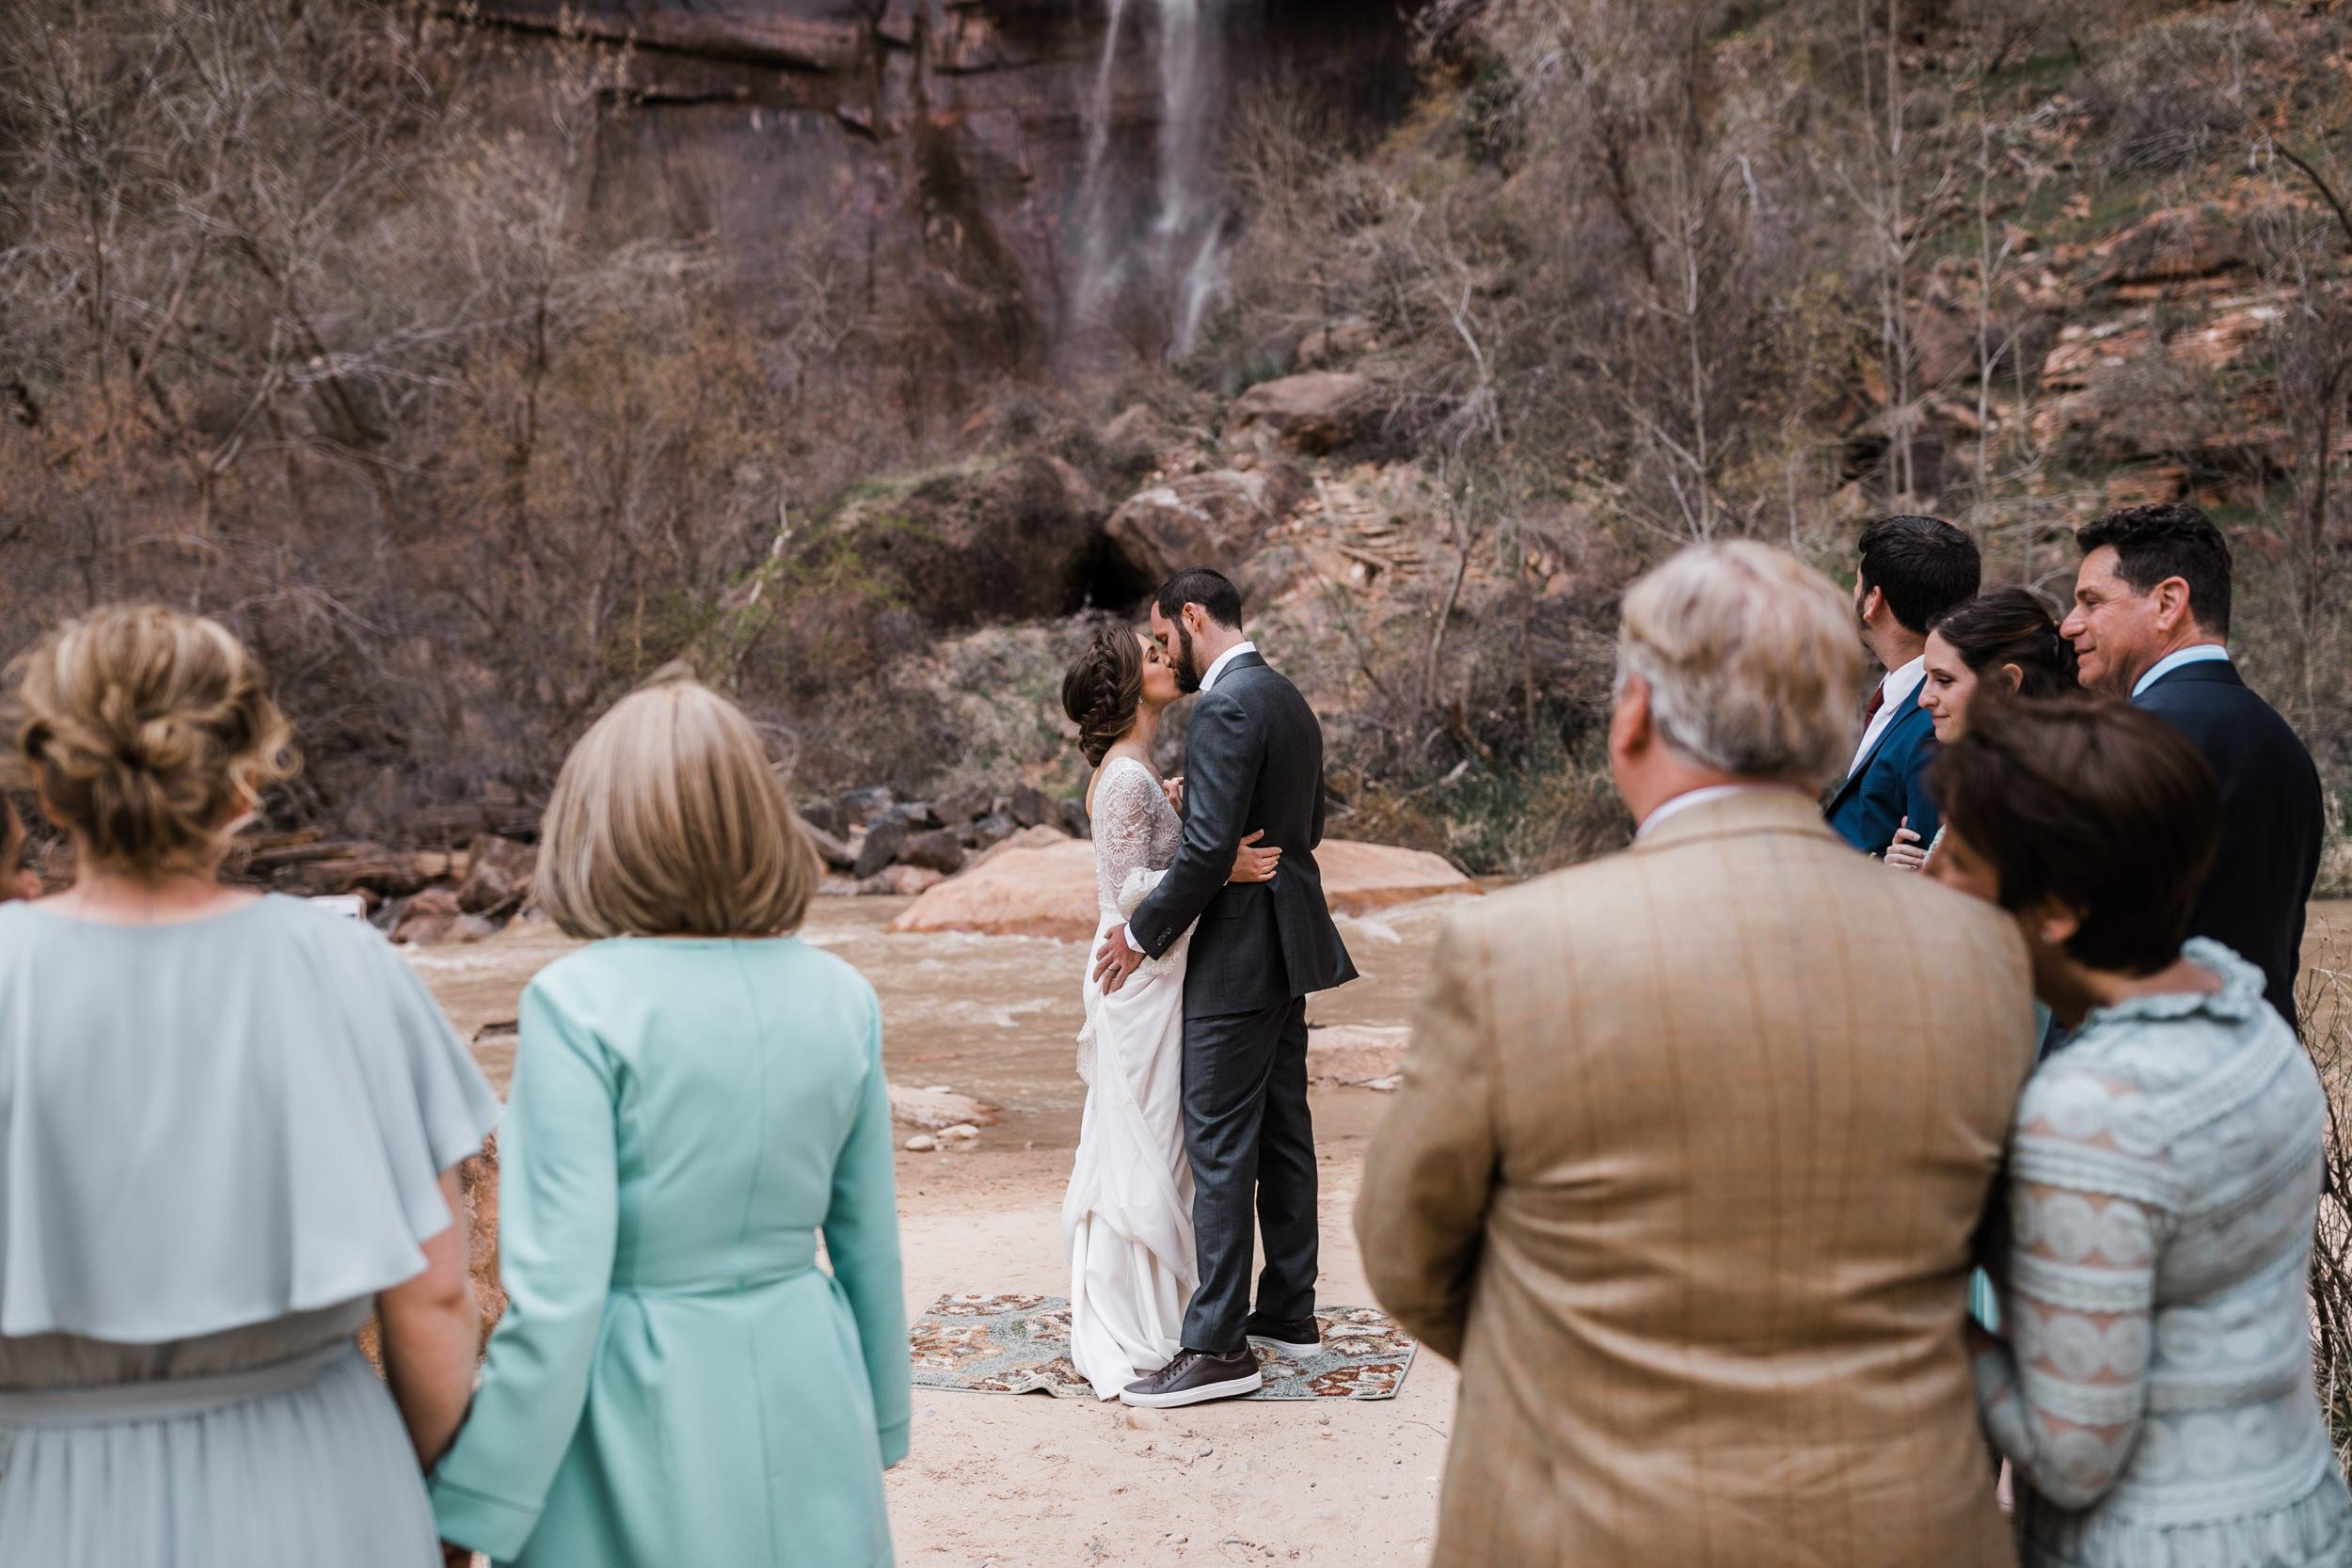 Zion-National-Park-Adventure-Wedding-Hearnes-Elopement-Photography-24.jpg